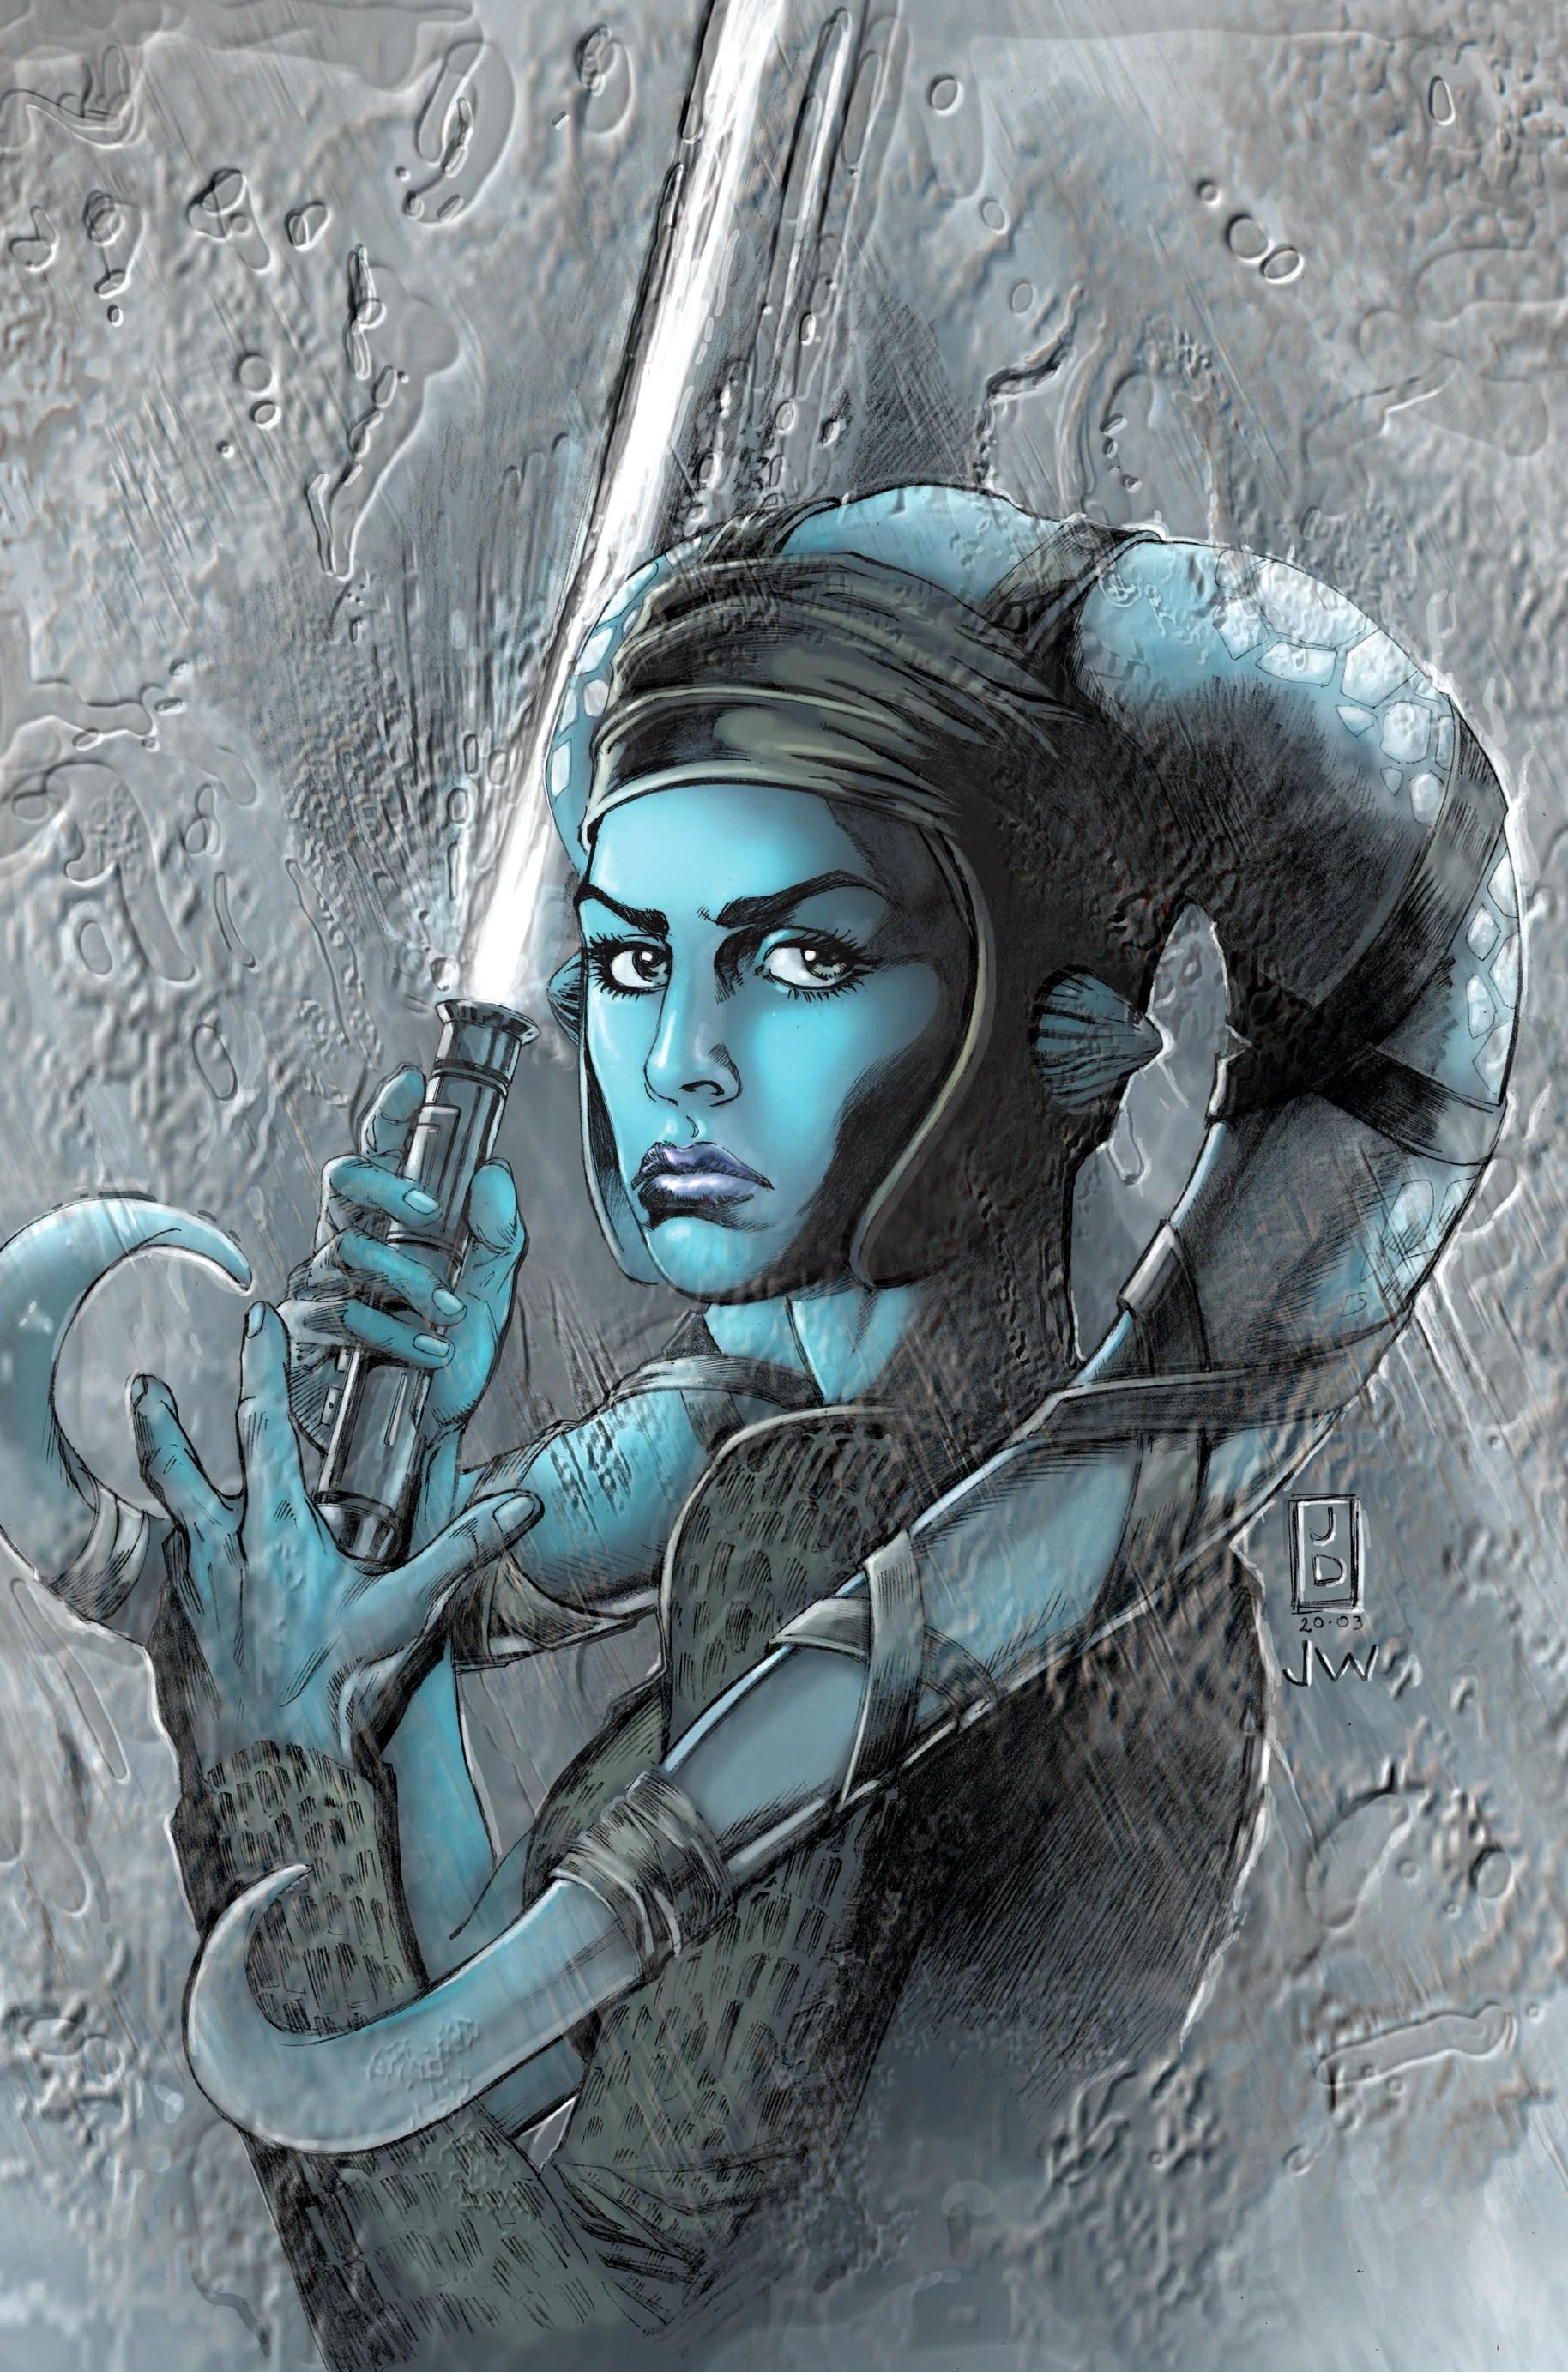 Jedi Aayla Secura Wookieepedia The Star Wars Wiki